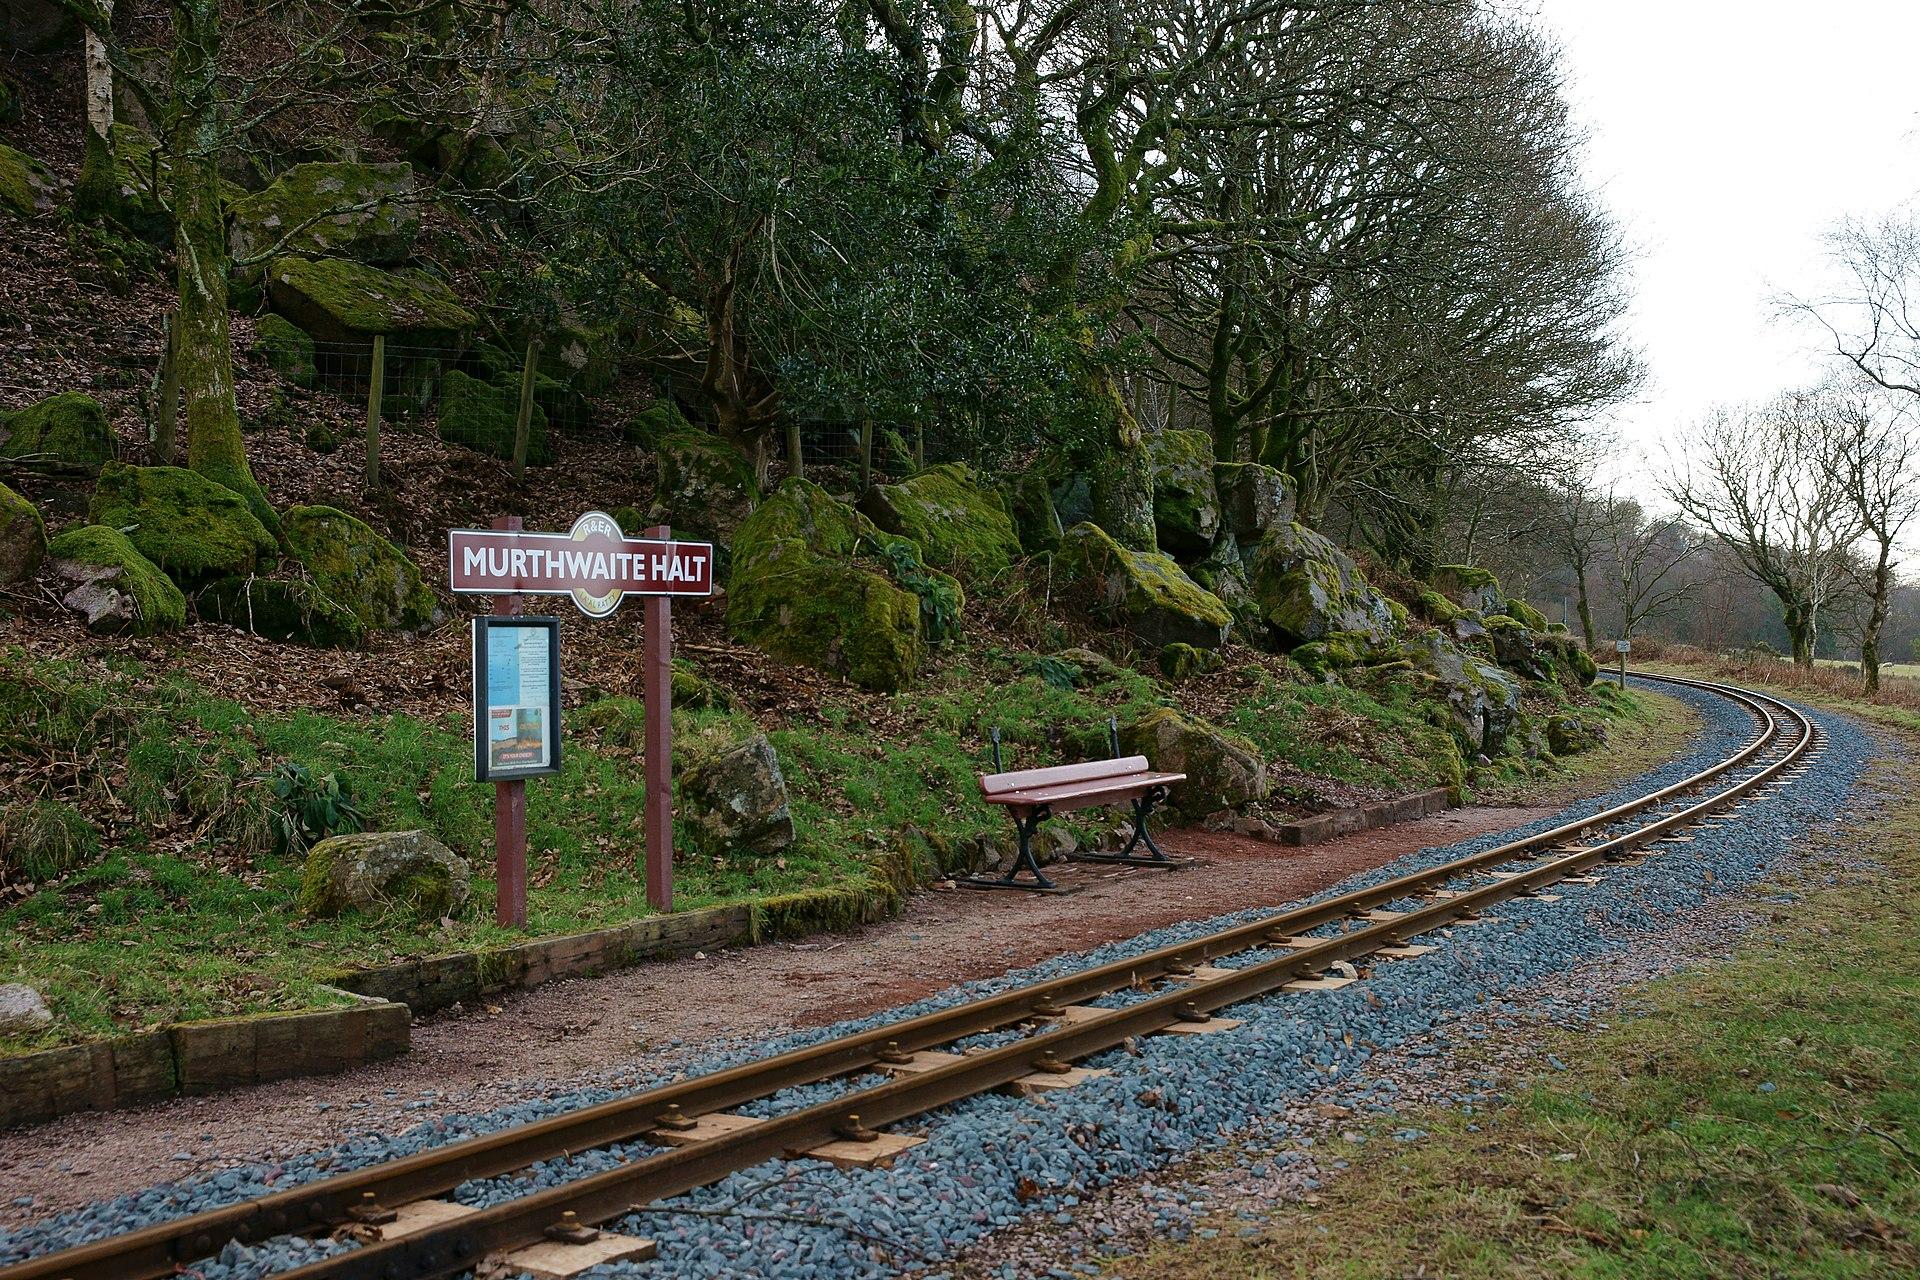 Murthwaite Halt Railway Station Wikipedia